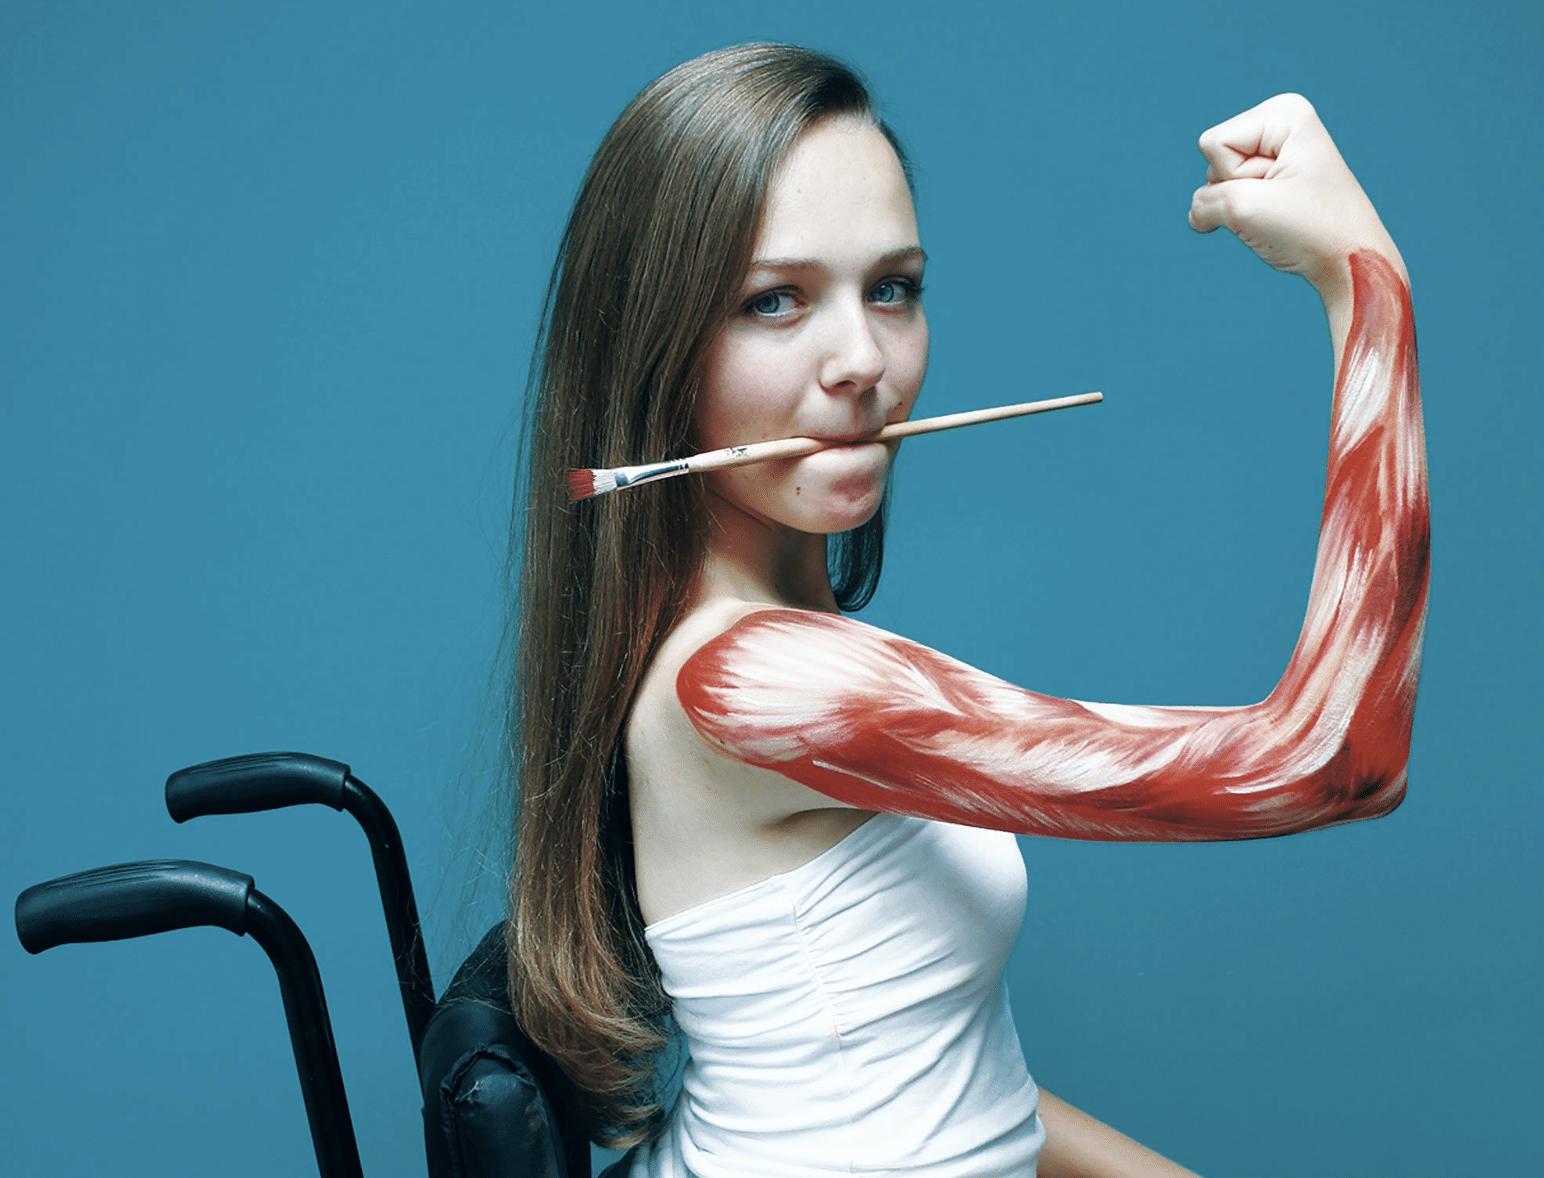 Spierziekten Vlaanderen Design